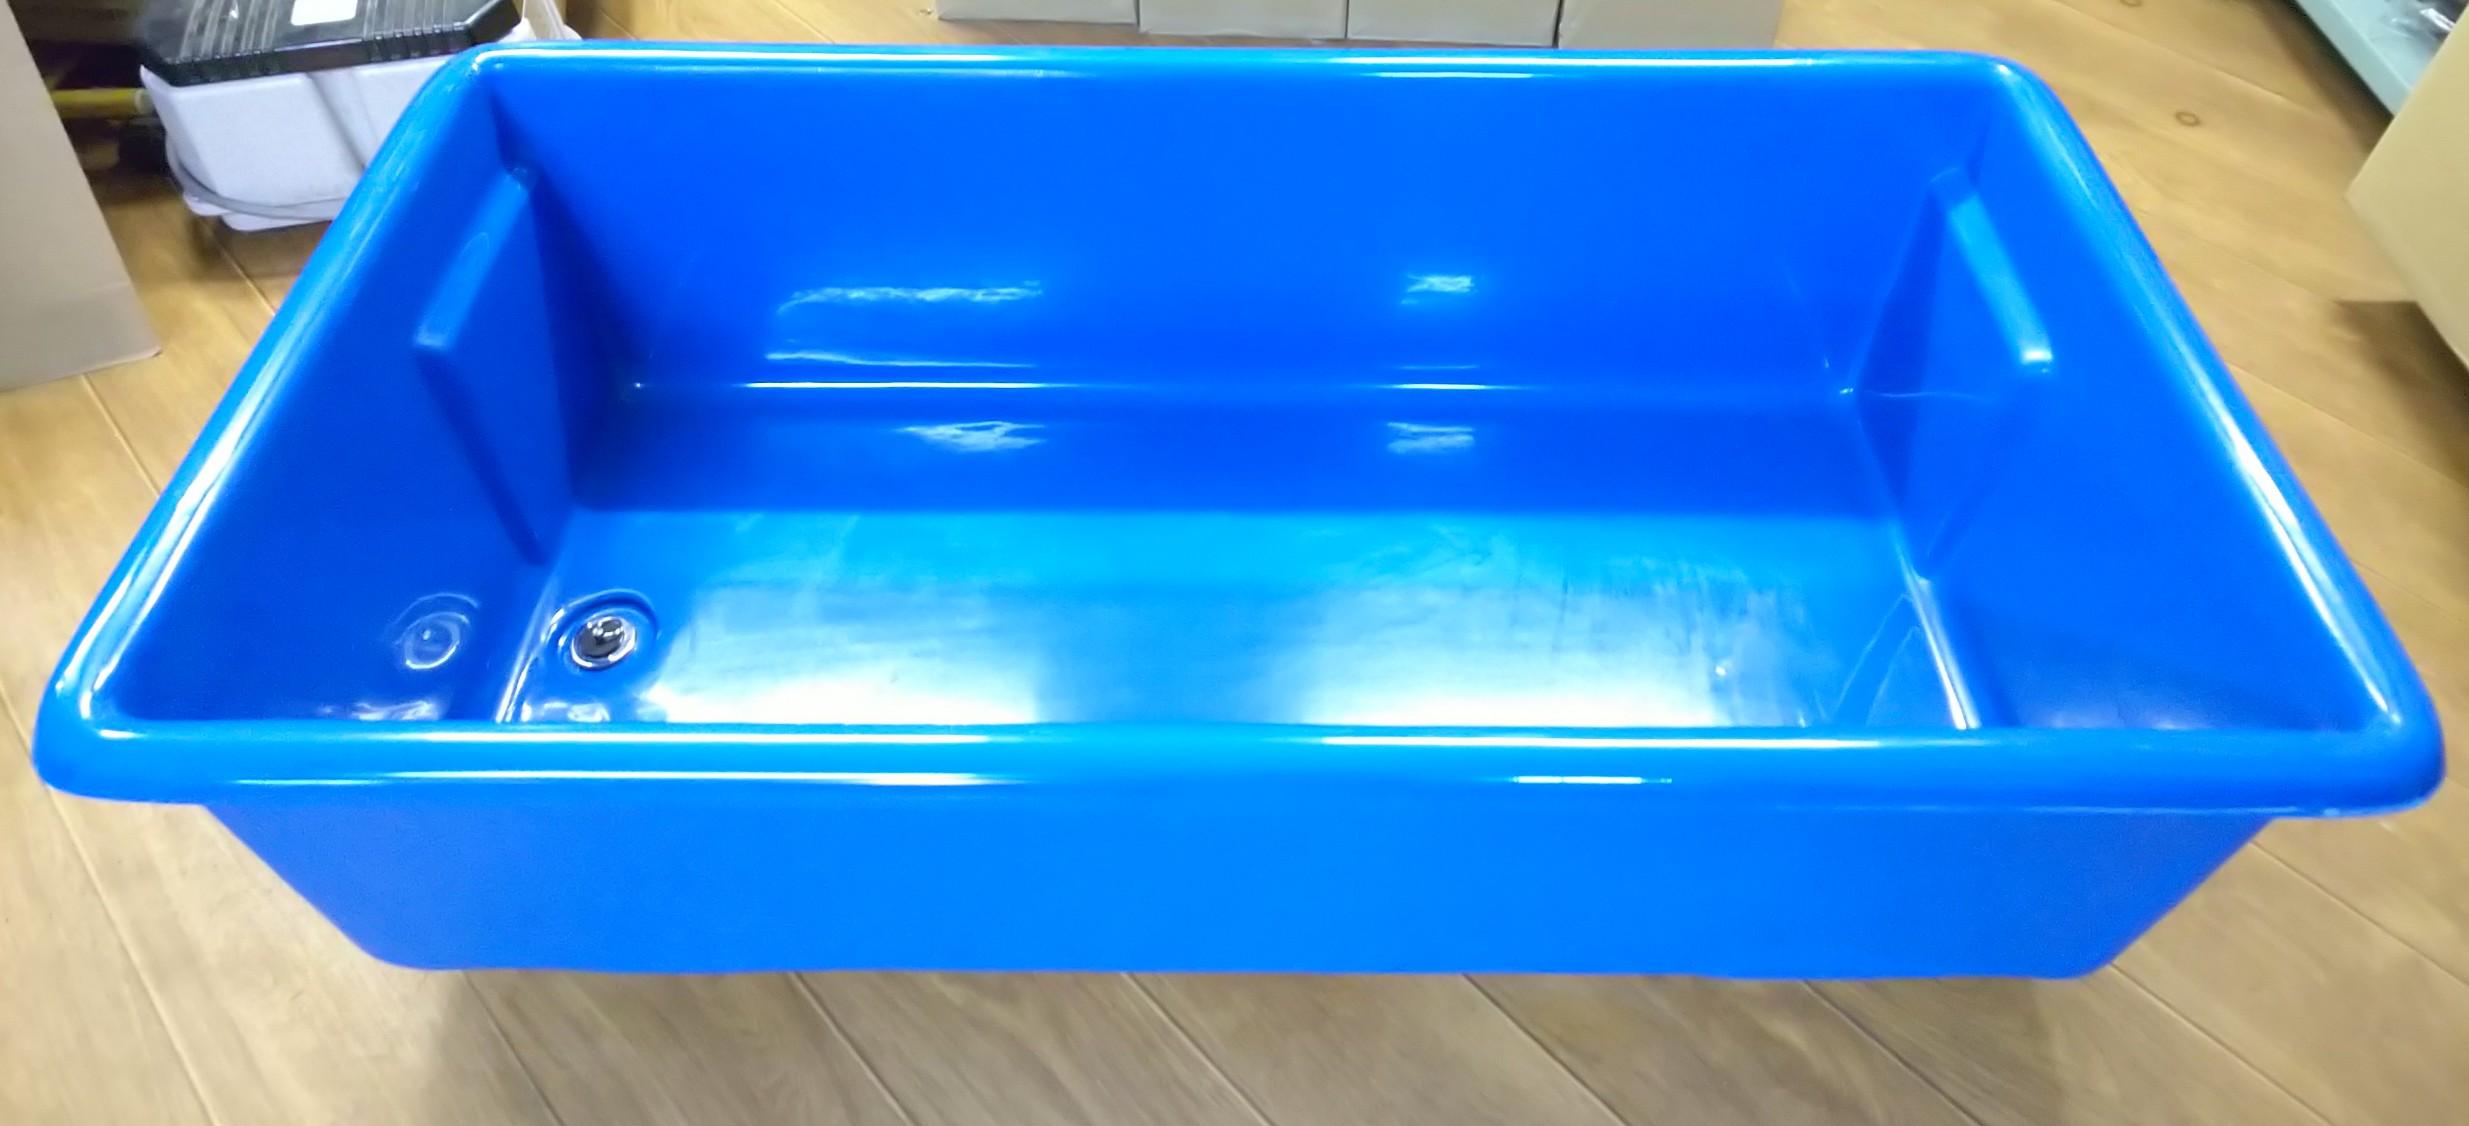 【送料・消費税込】FRP水槽 小型水槽 錦鯉検寸器 メジャーなし 飼育水槽